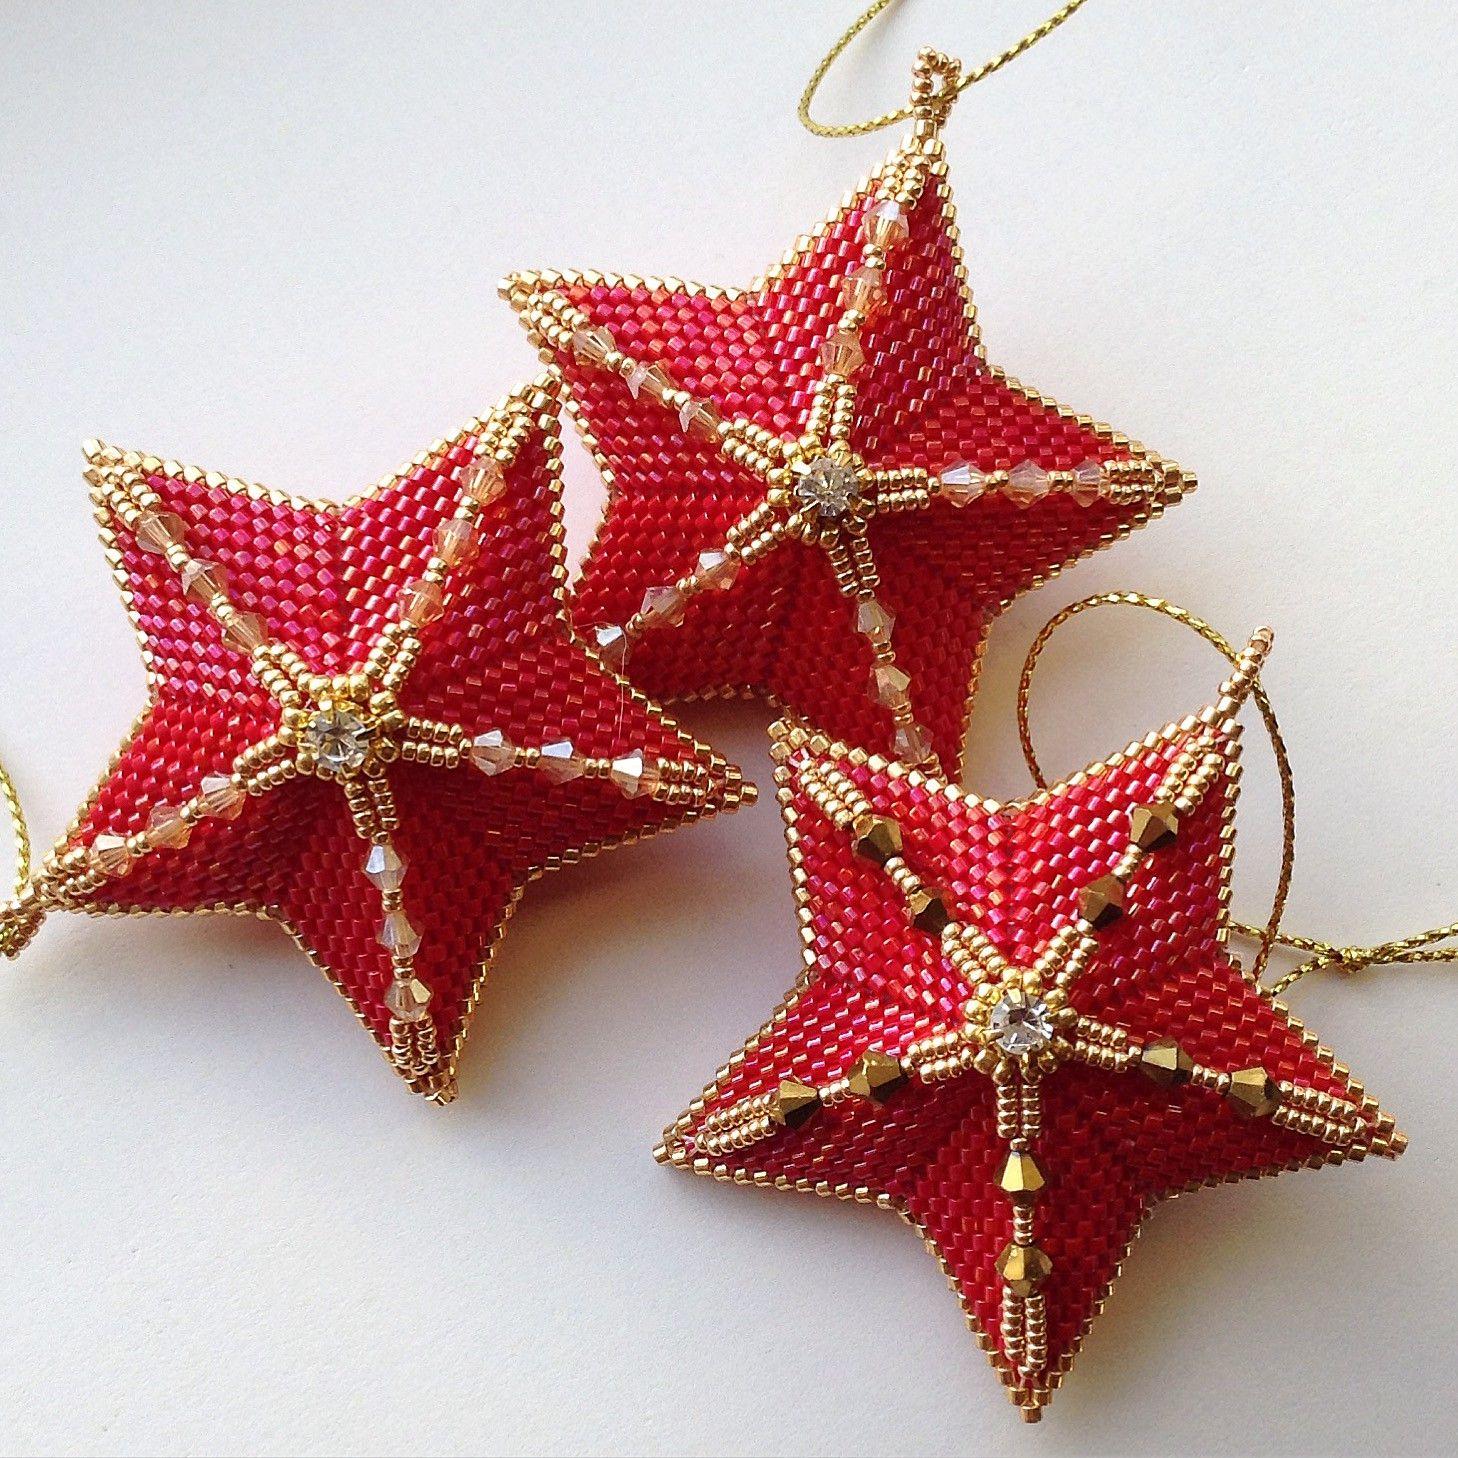 Christmas Stars Christmas Star Star Ornament Beaded Christmas Ornaments